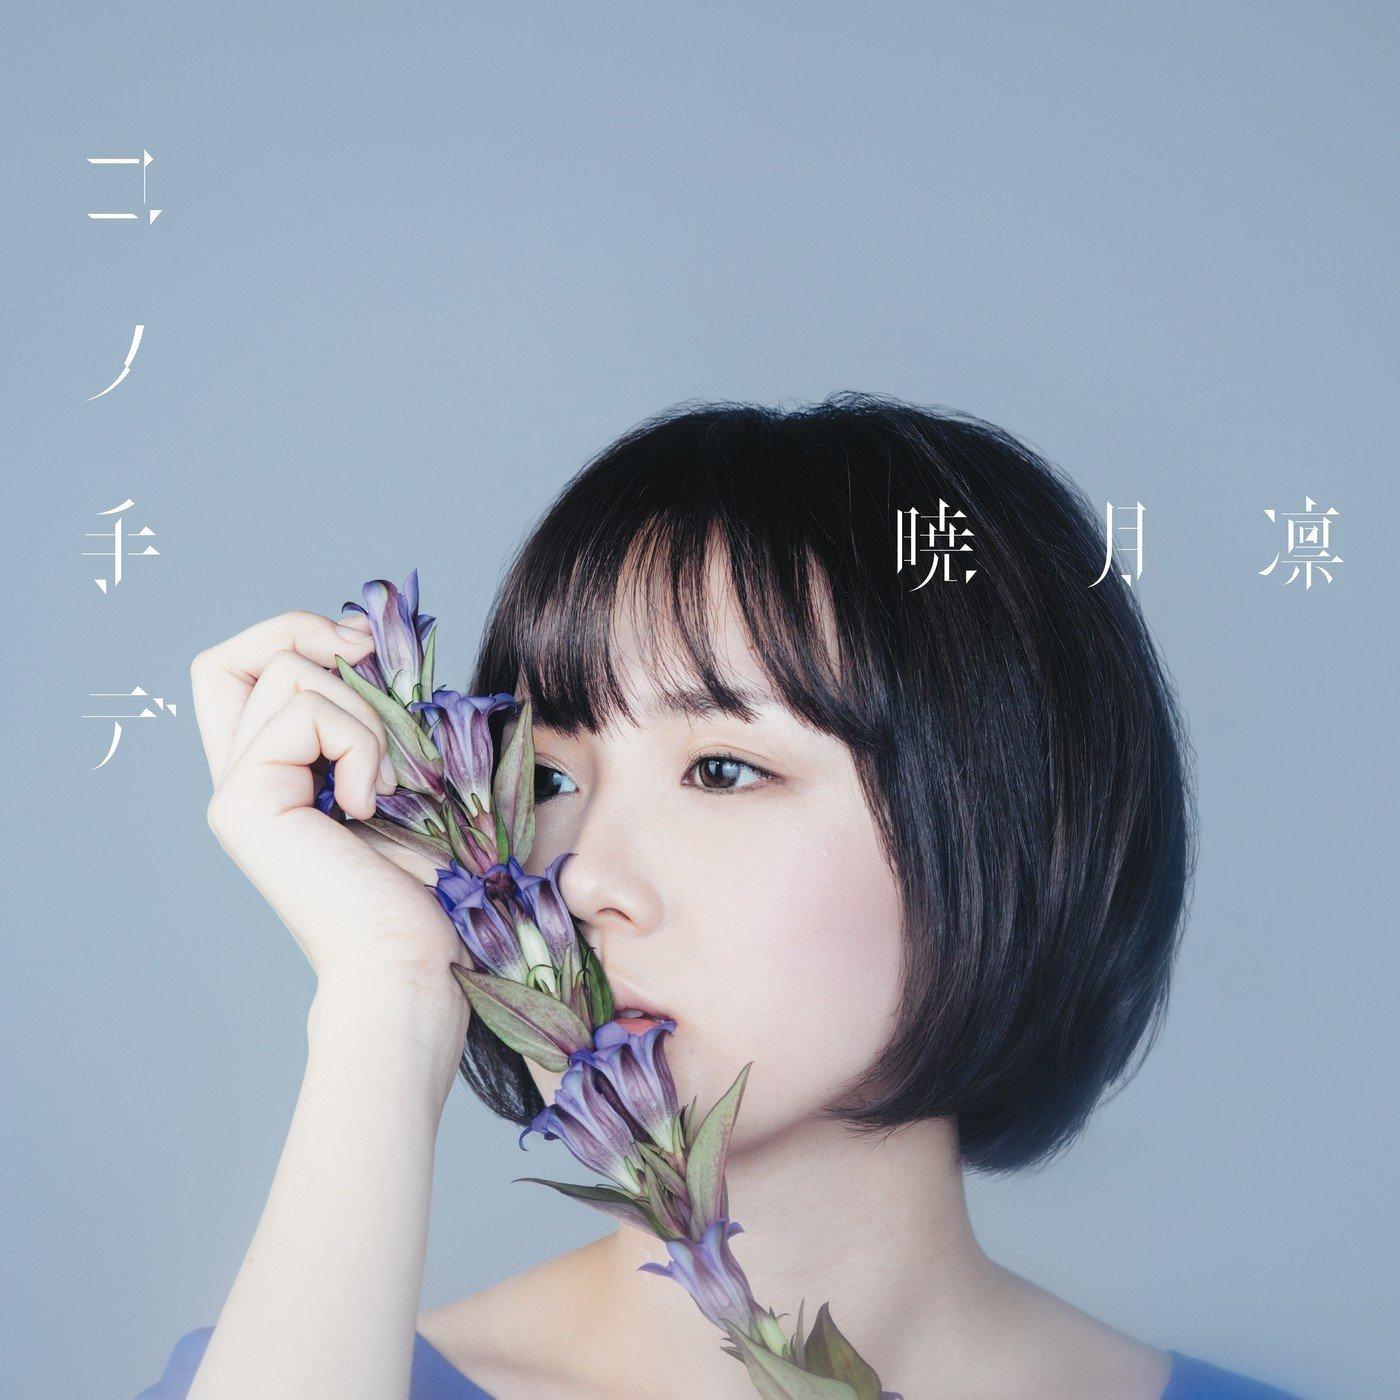 [Single] 暁月凛 (Rin Akatsuki) – コノ手デ(Special Edition) [FLAC / 24bit Lossless / WEB] [2017.02.15]